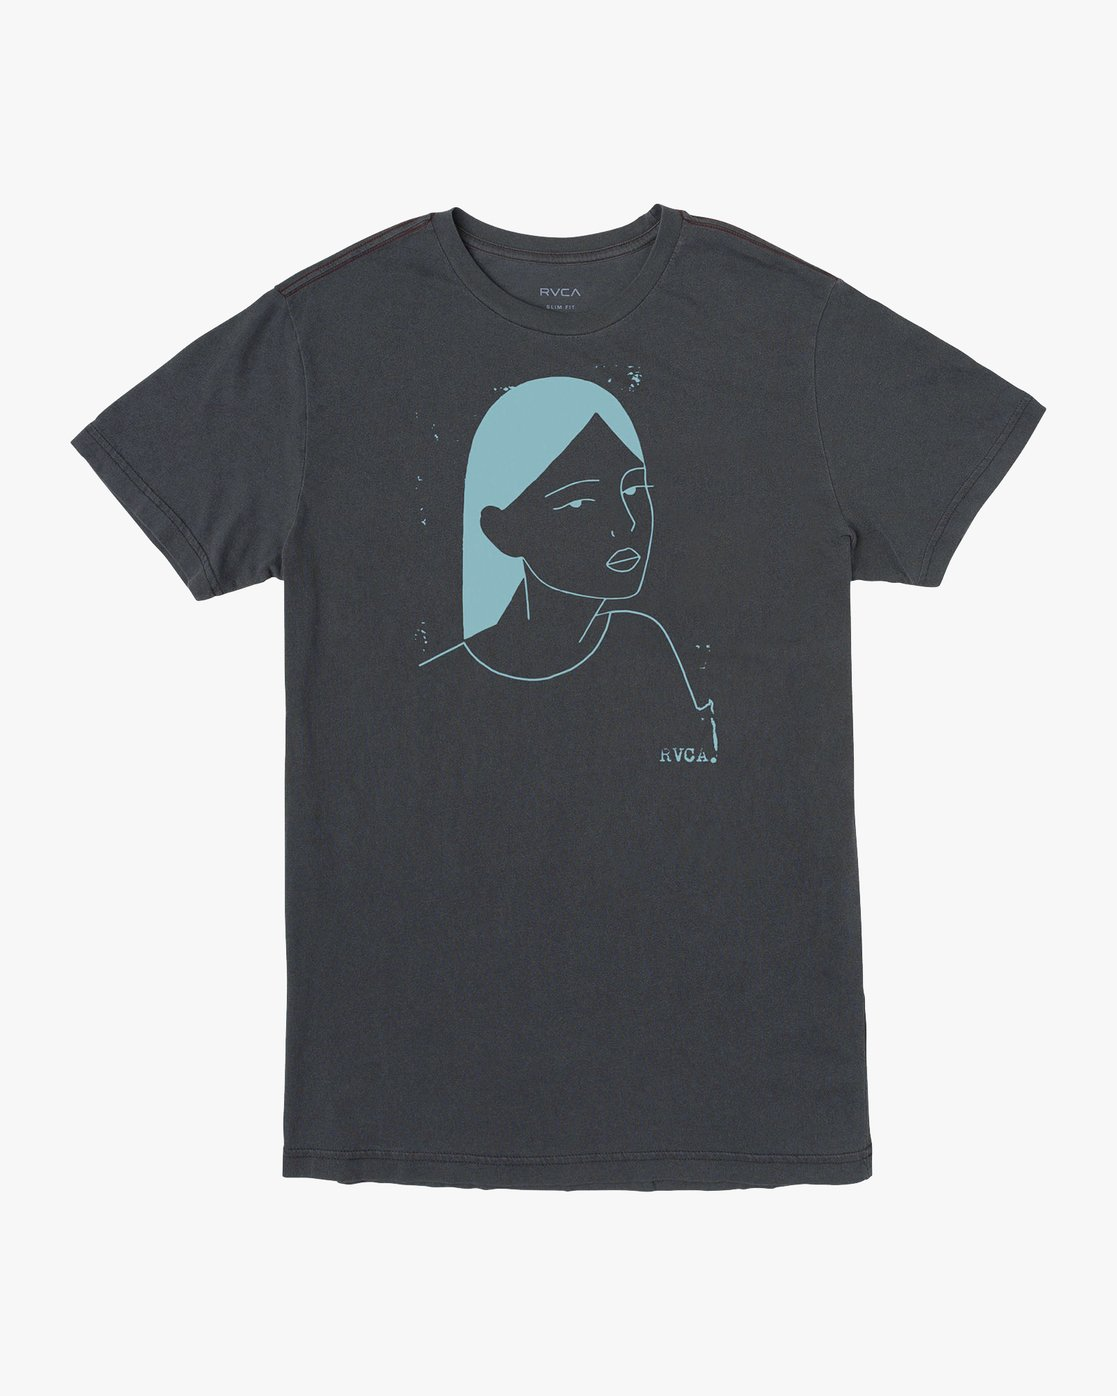 0 Johanna Olk Frosty Gaze T-Shirt Black M438URFR RVCA